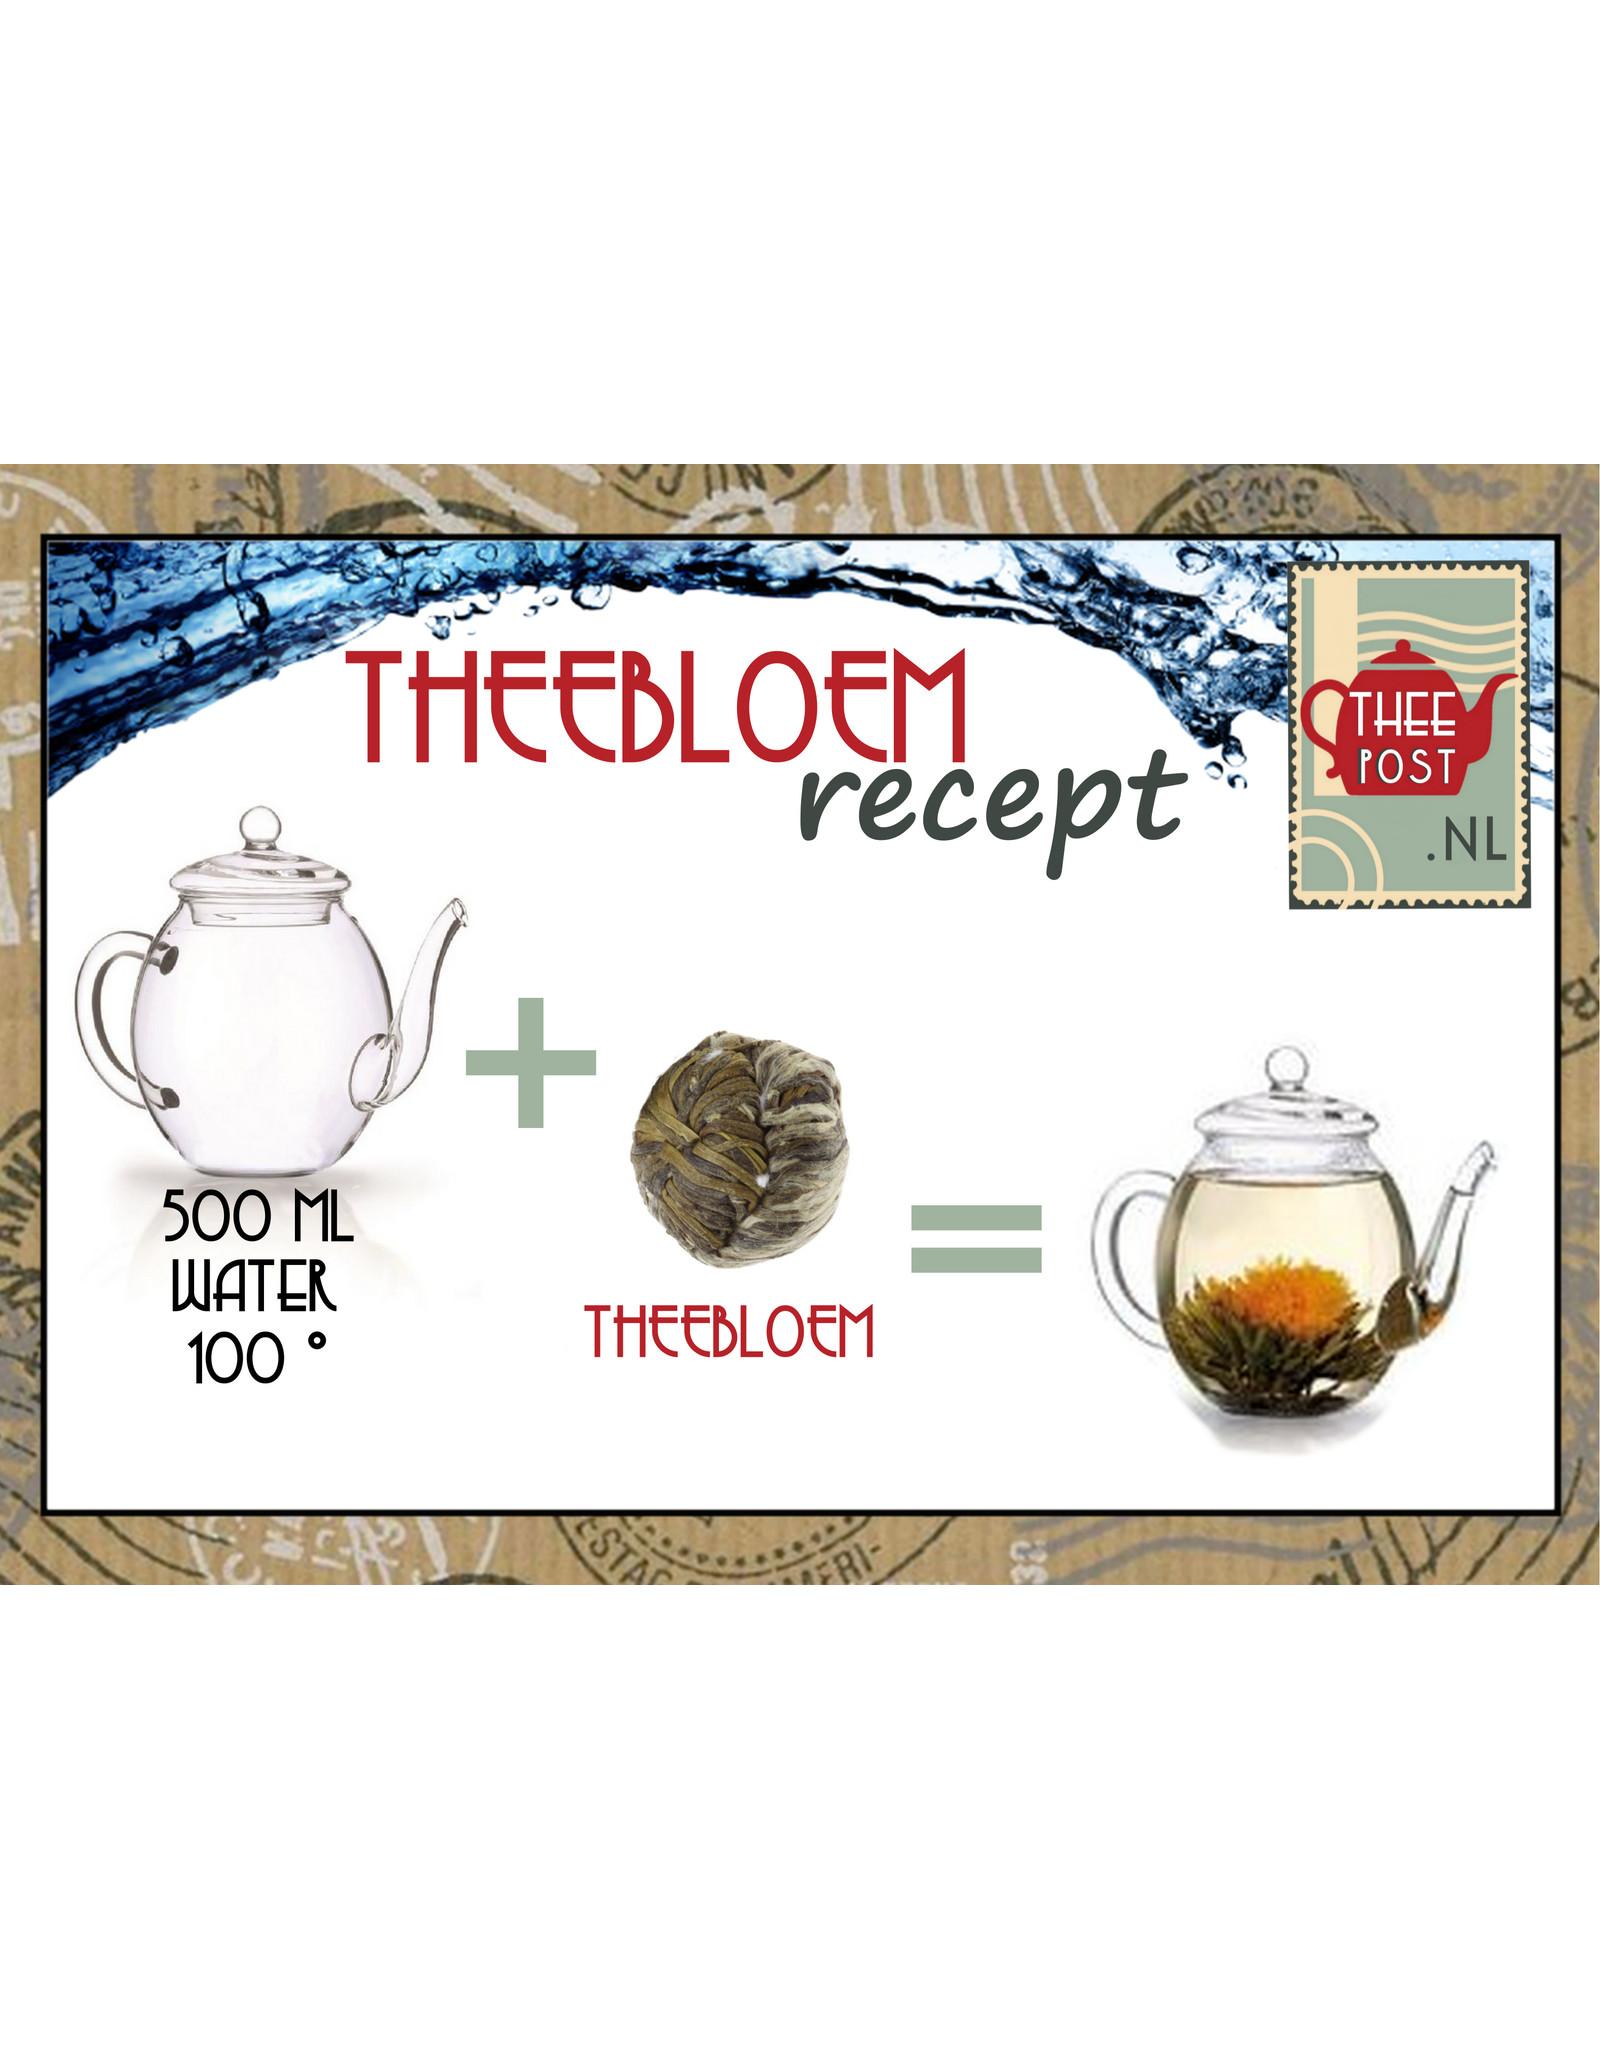 Theebloem van witte thee met twee goudsbloemen